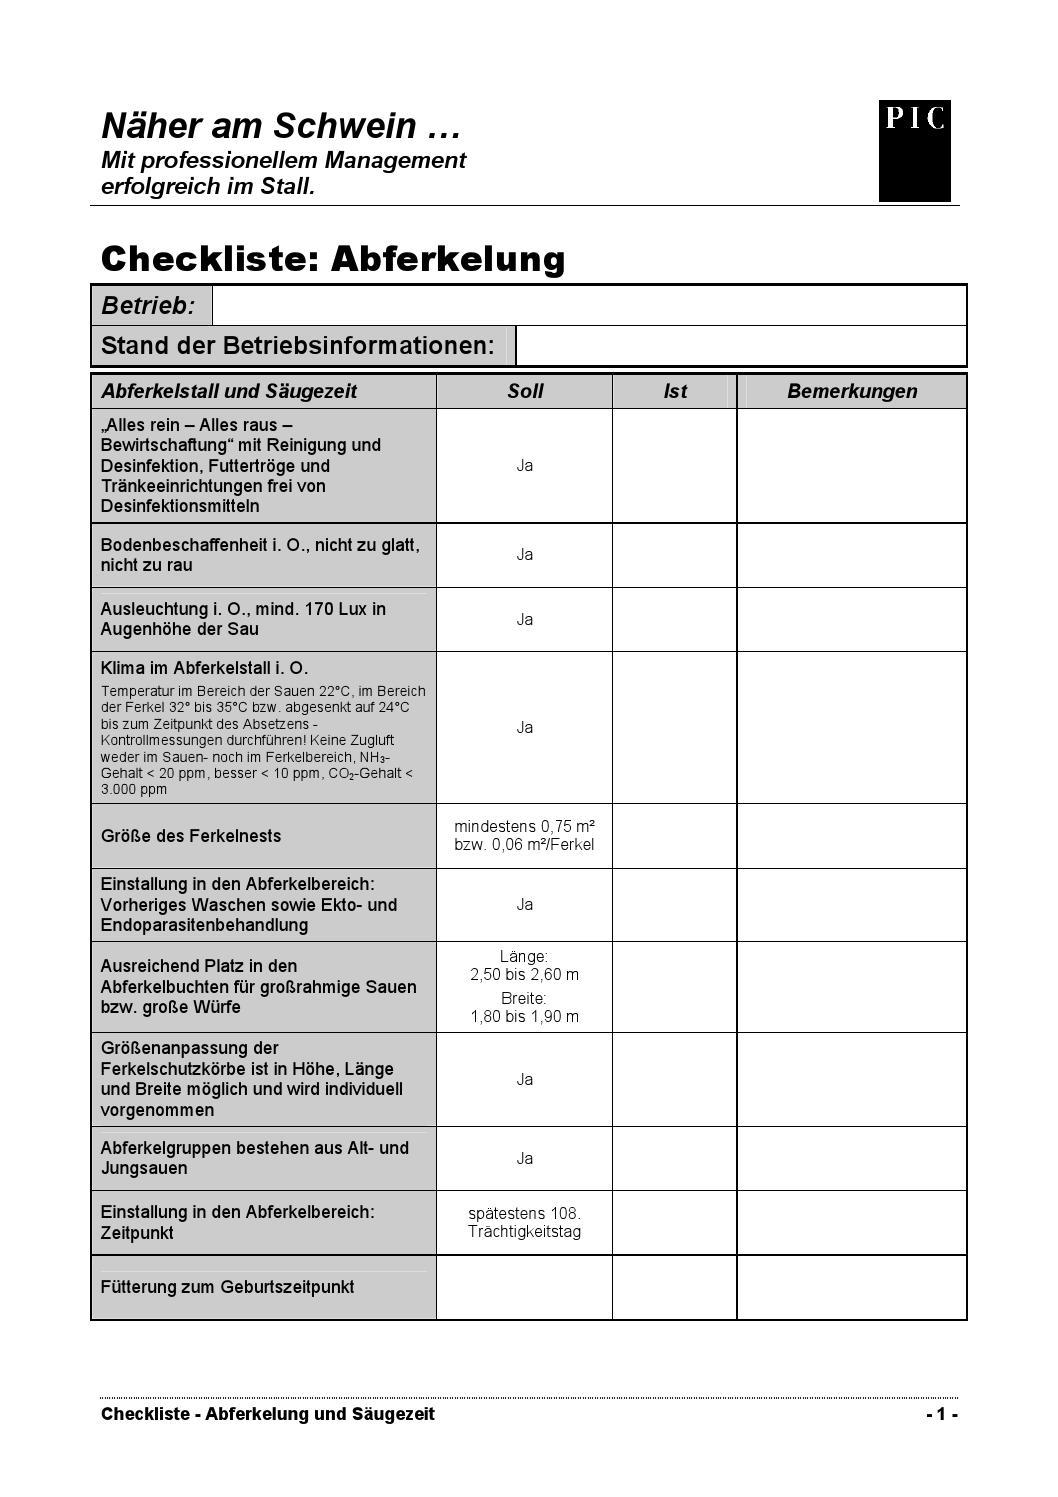 Berühmt Drahtseil Checkliste Ideen - Schaltplan Serie Circuit ...